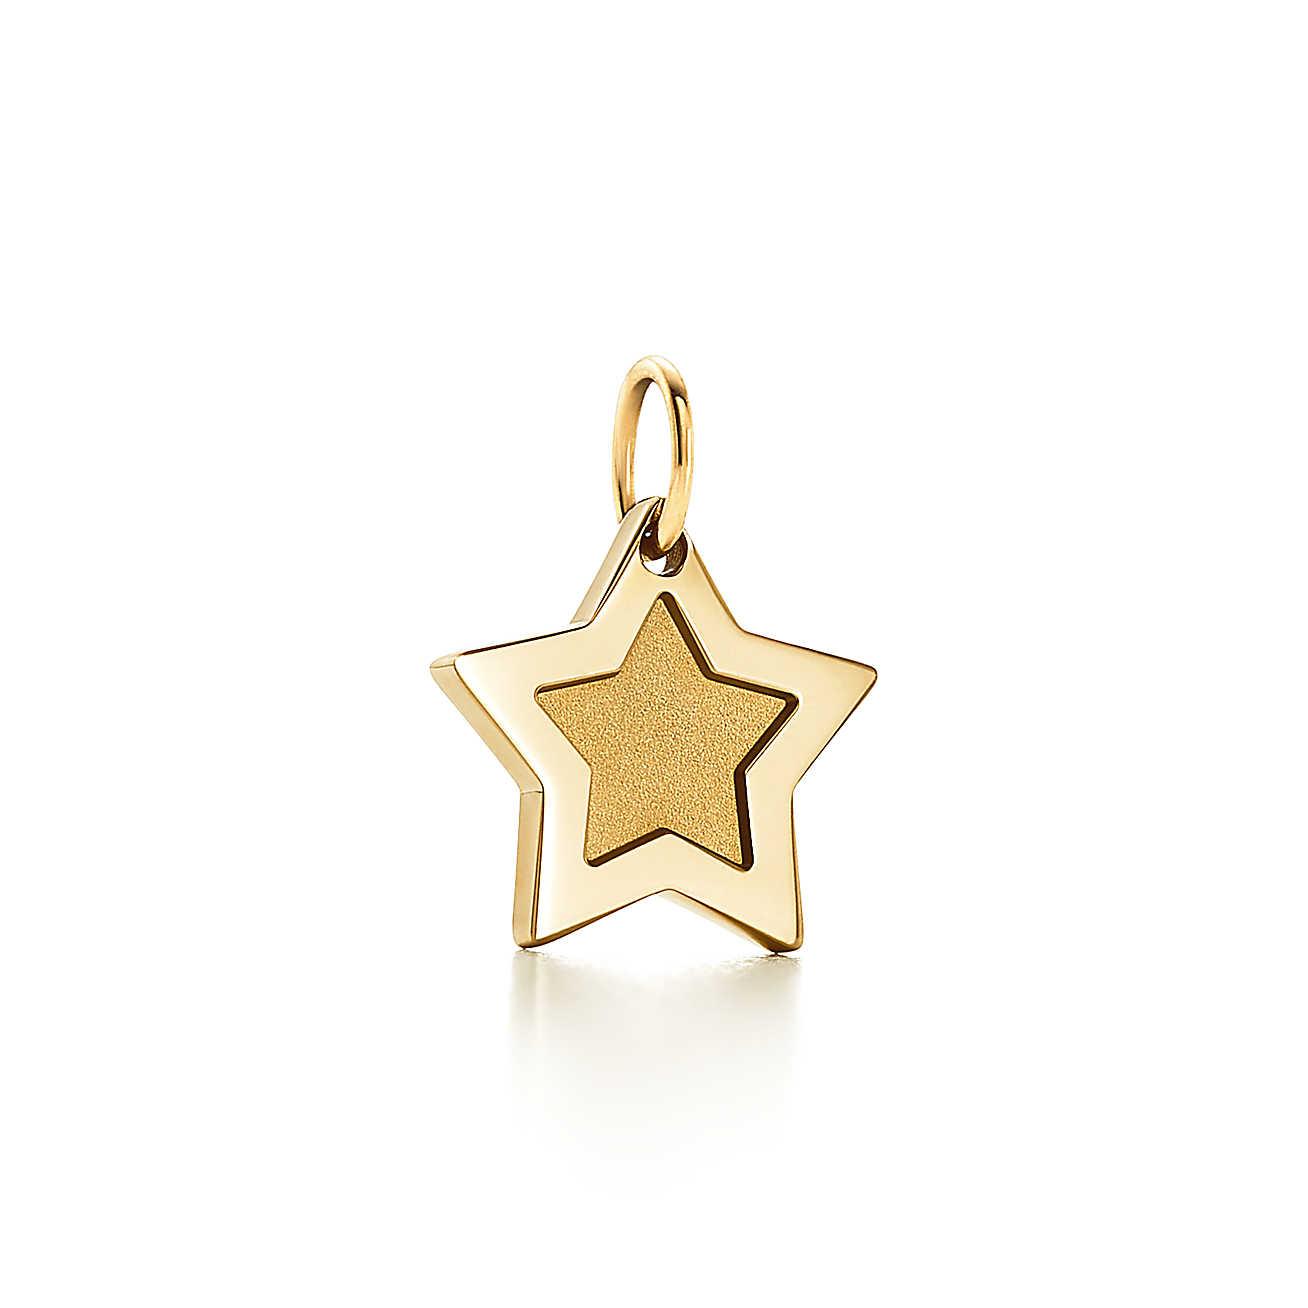 tiffany-charmssuper-star-charm-35745874_956291_ED